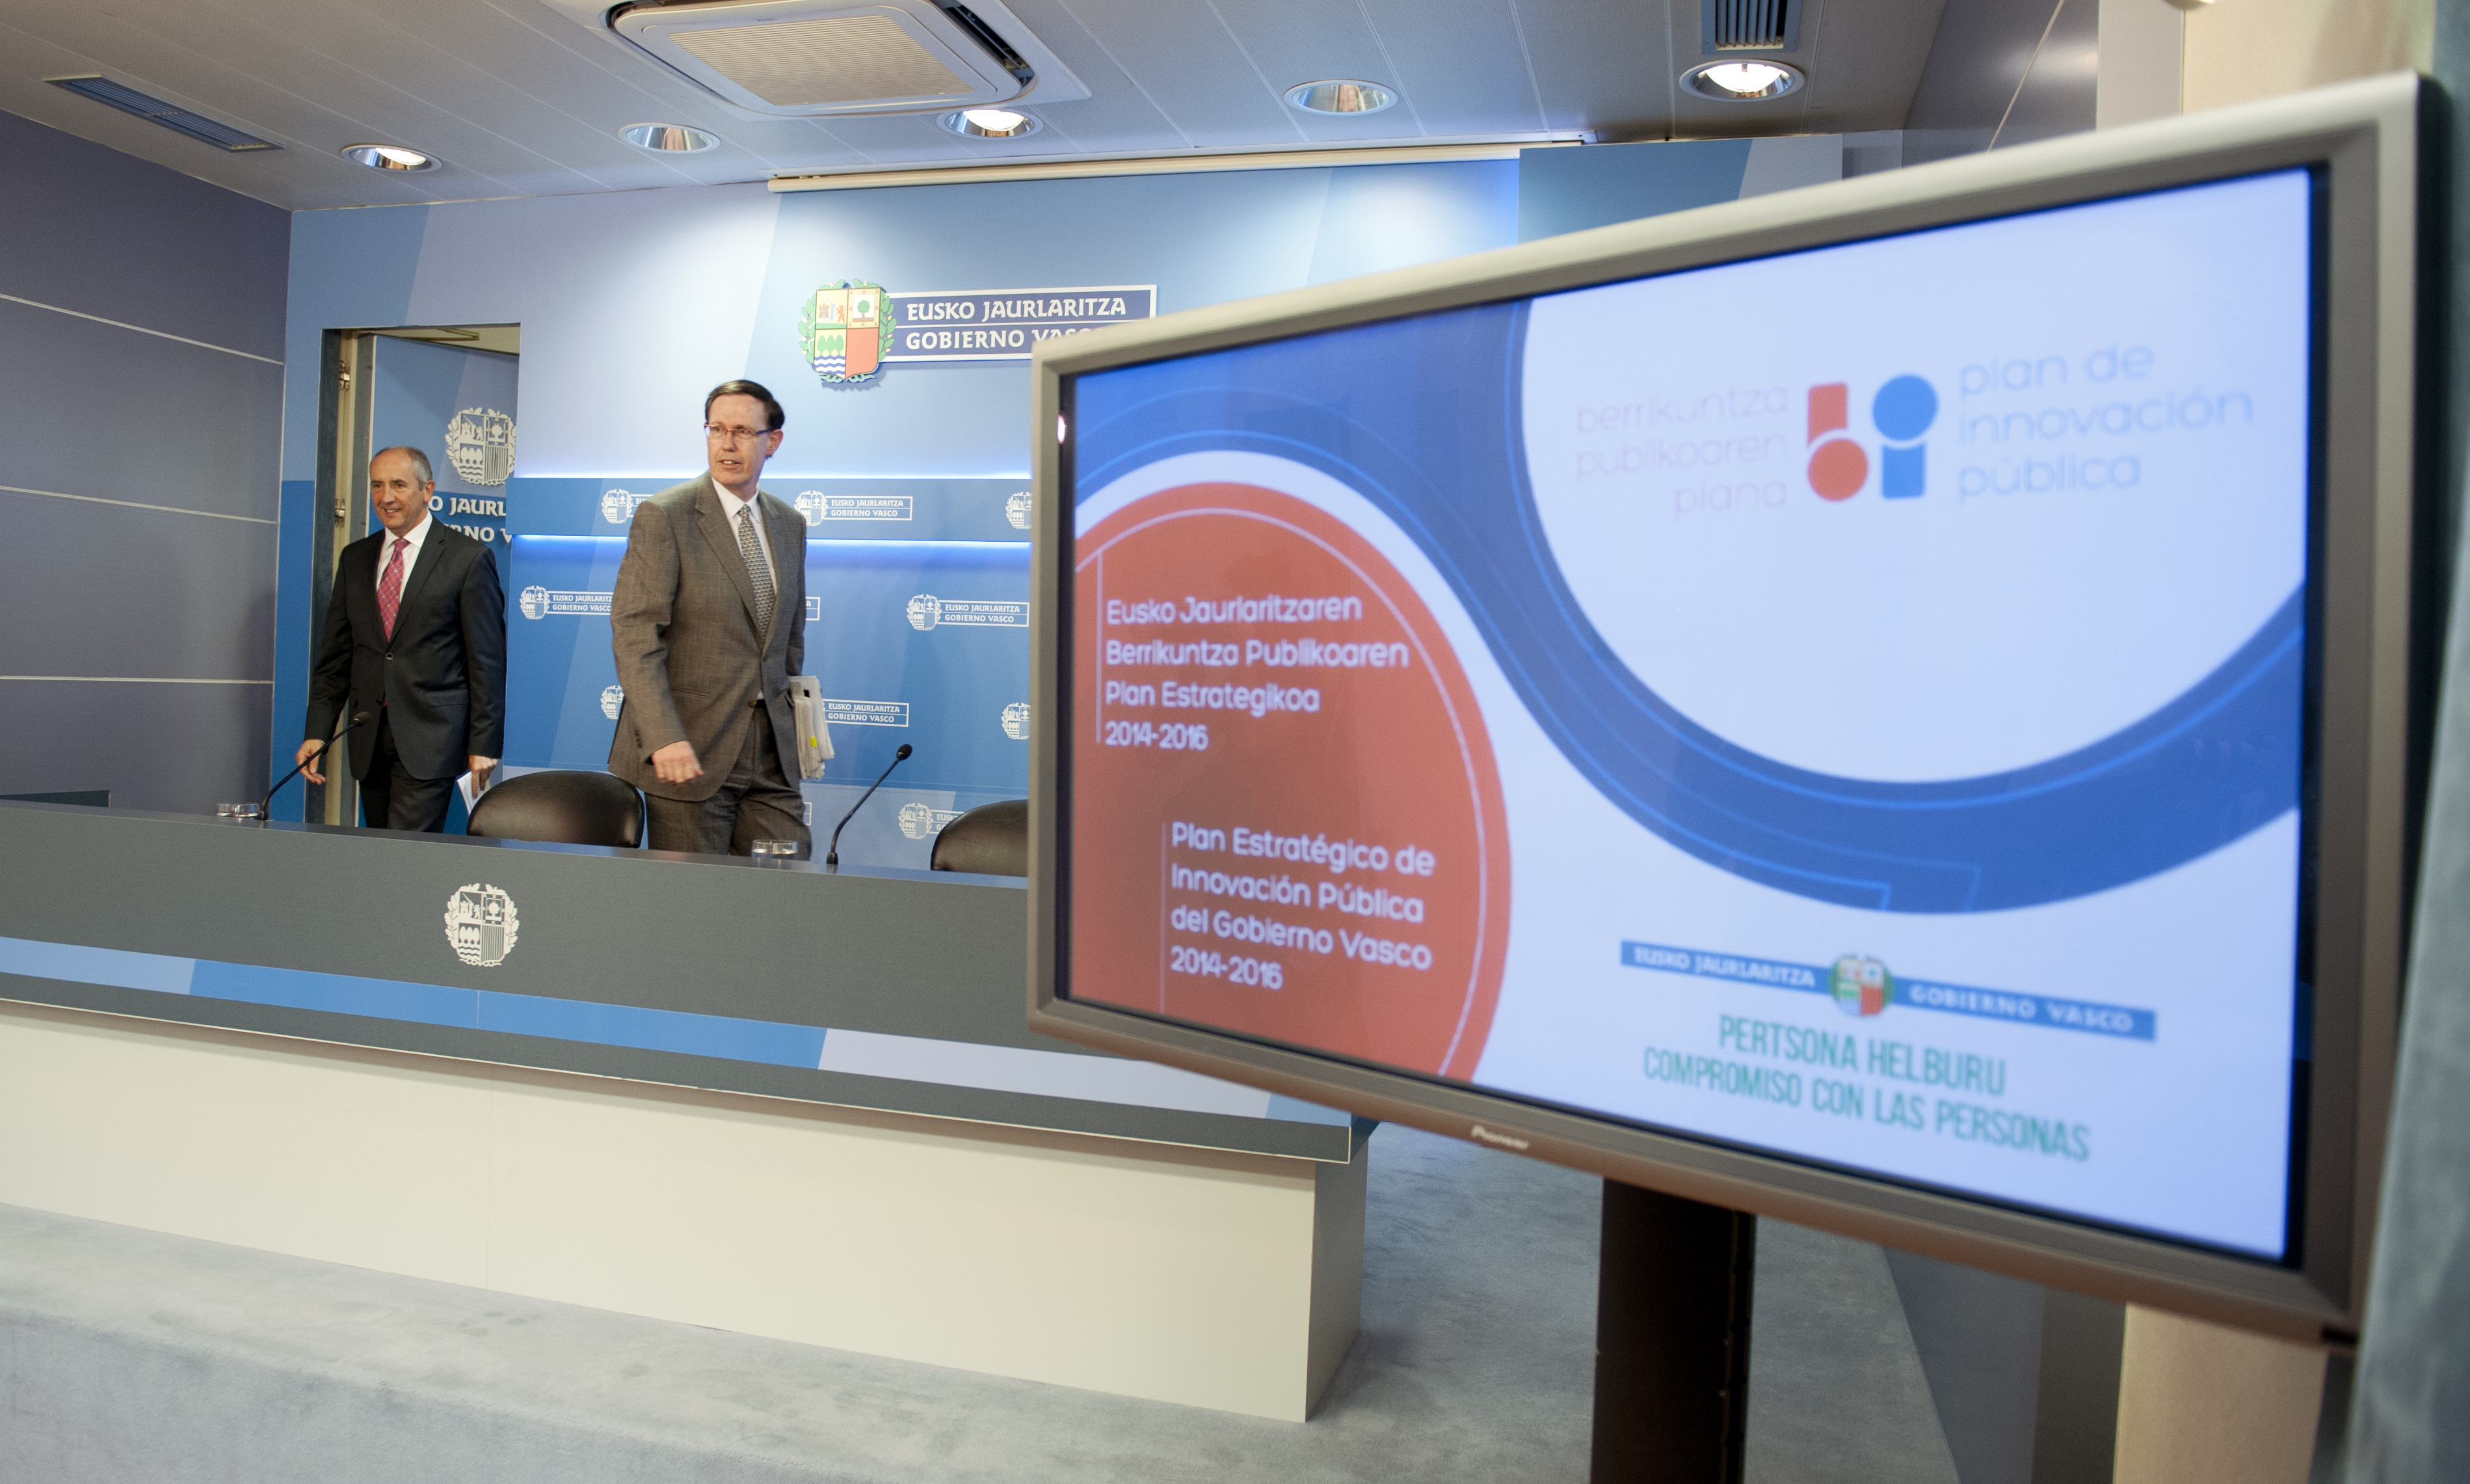 2014_06_17_consejo_gobierno_02.jpg